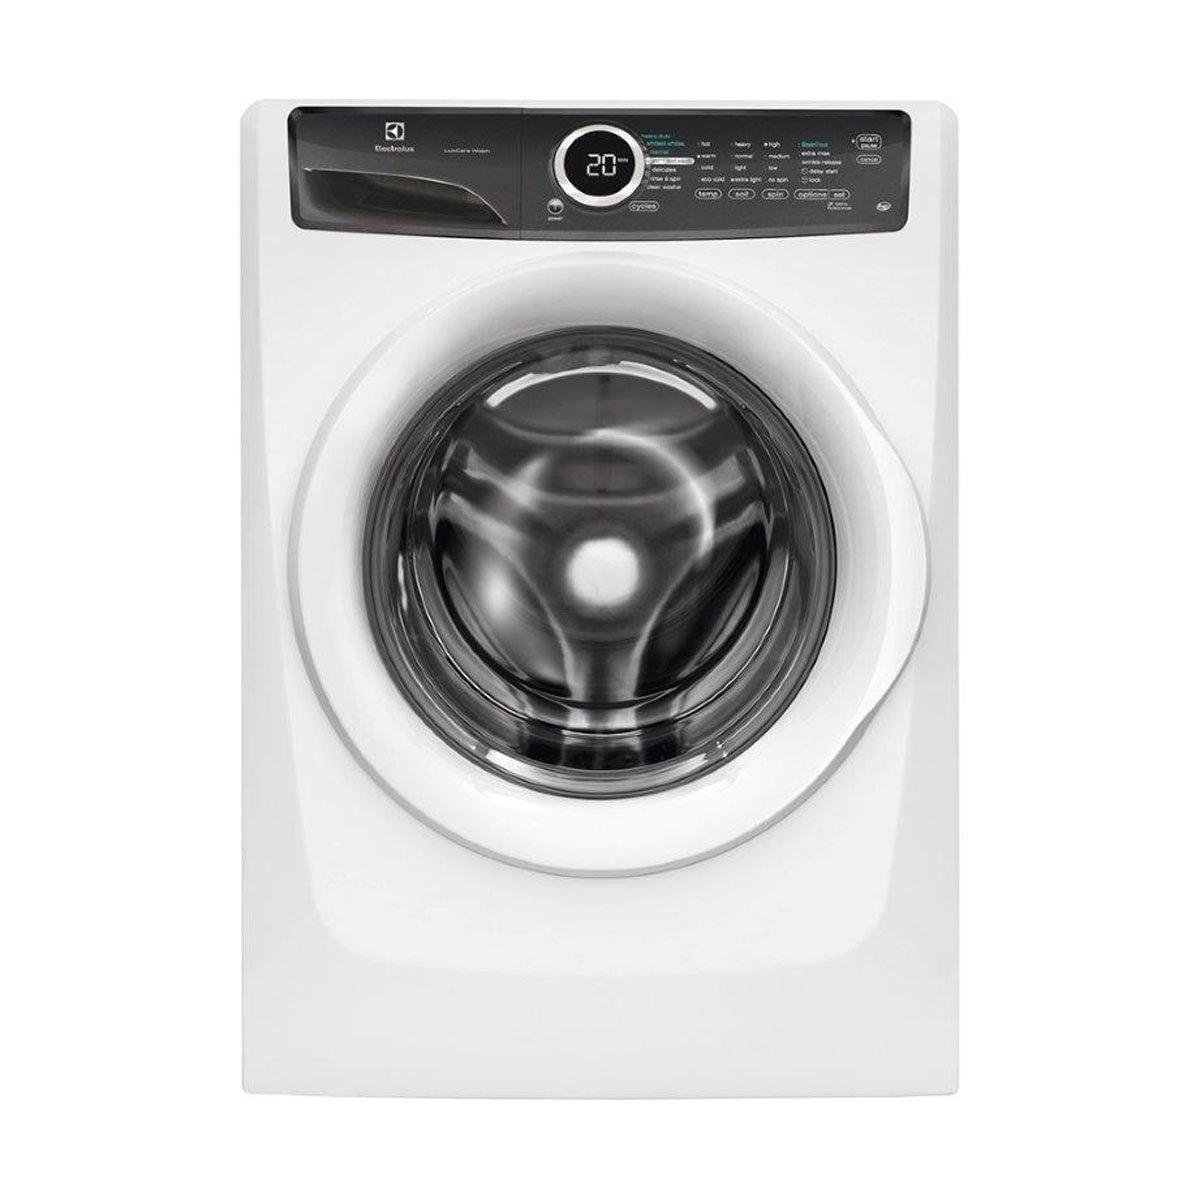 Lavadora electrolux frontal 21kg blanca sears com mx for Funcion de la lavadora